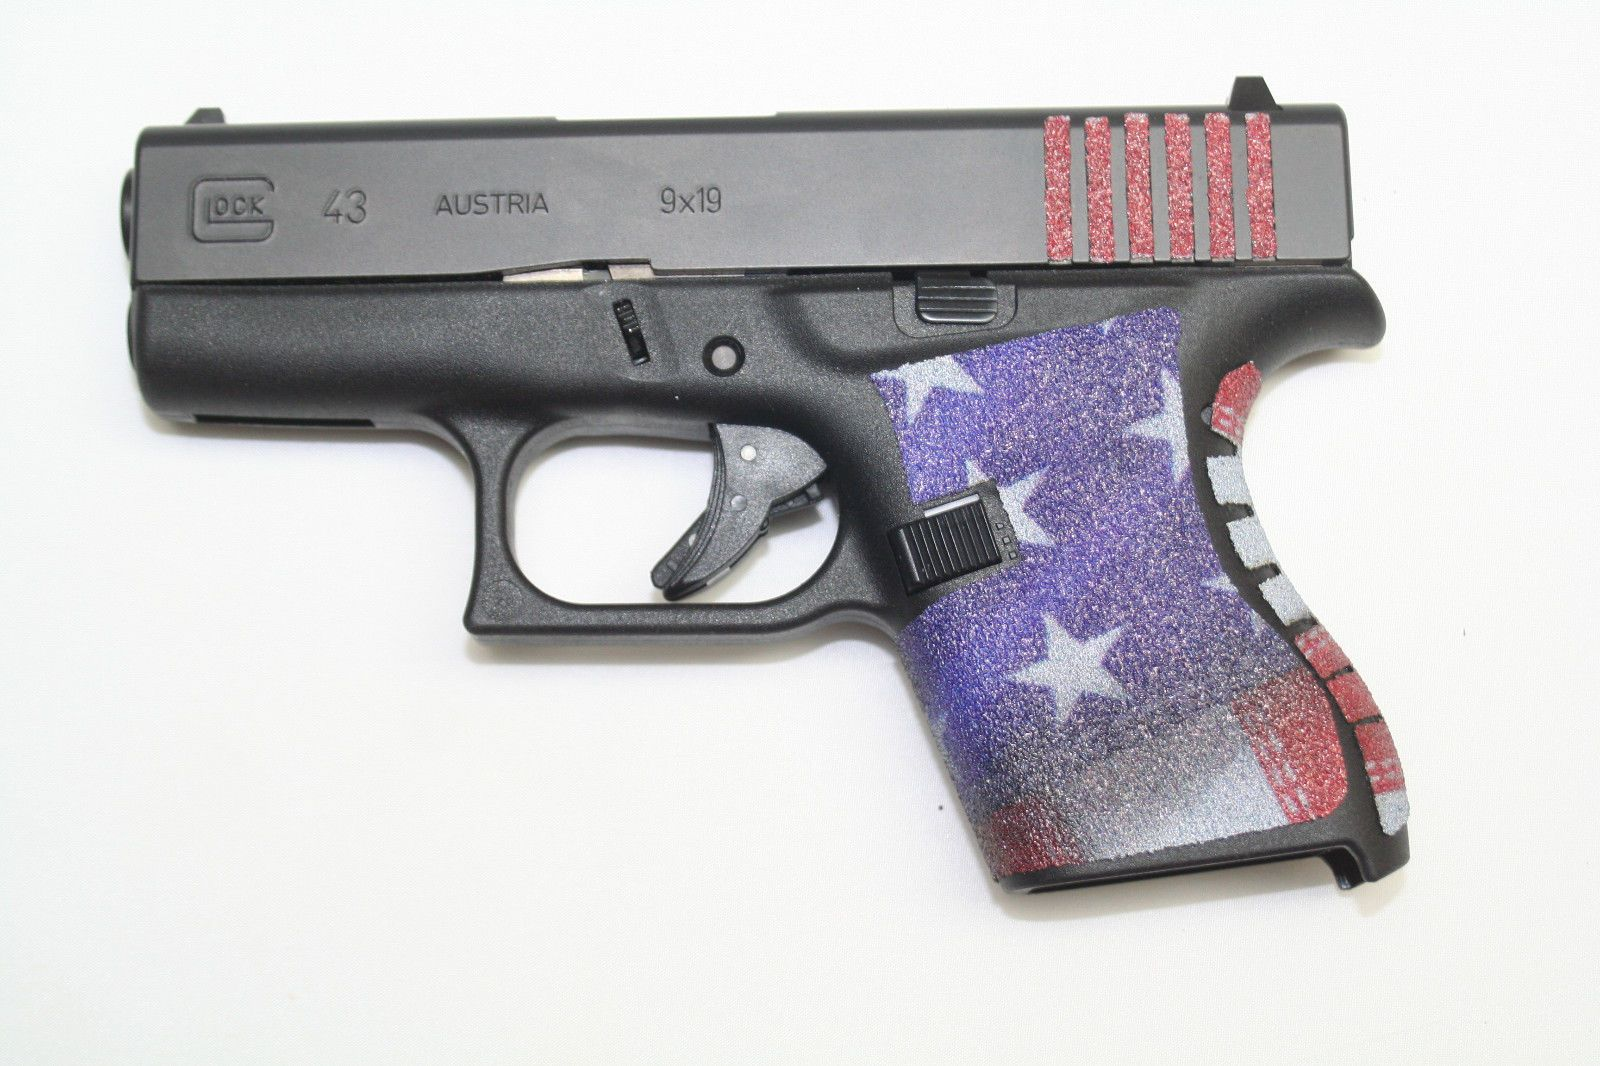 fa221d770fae AMERICAN FLAG custom GRIP TAPE FITS 43HANDGUN GUN PISTOLNONE SLIP American  Flag